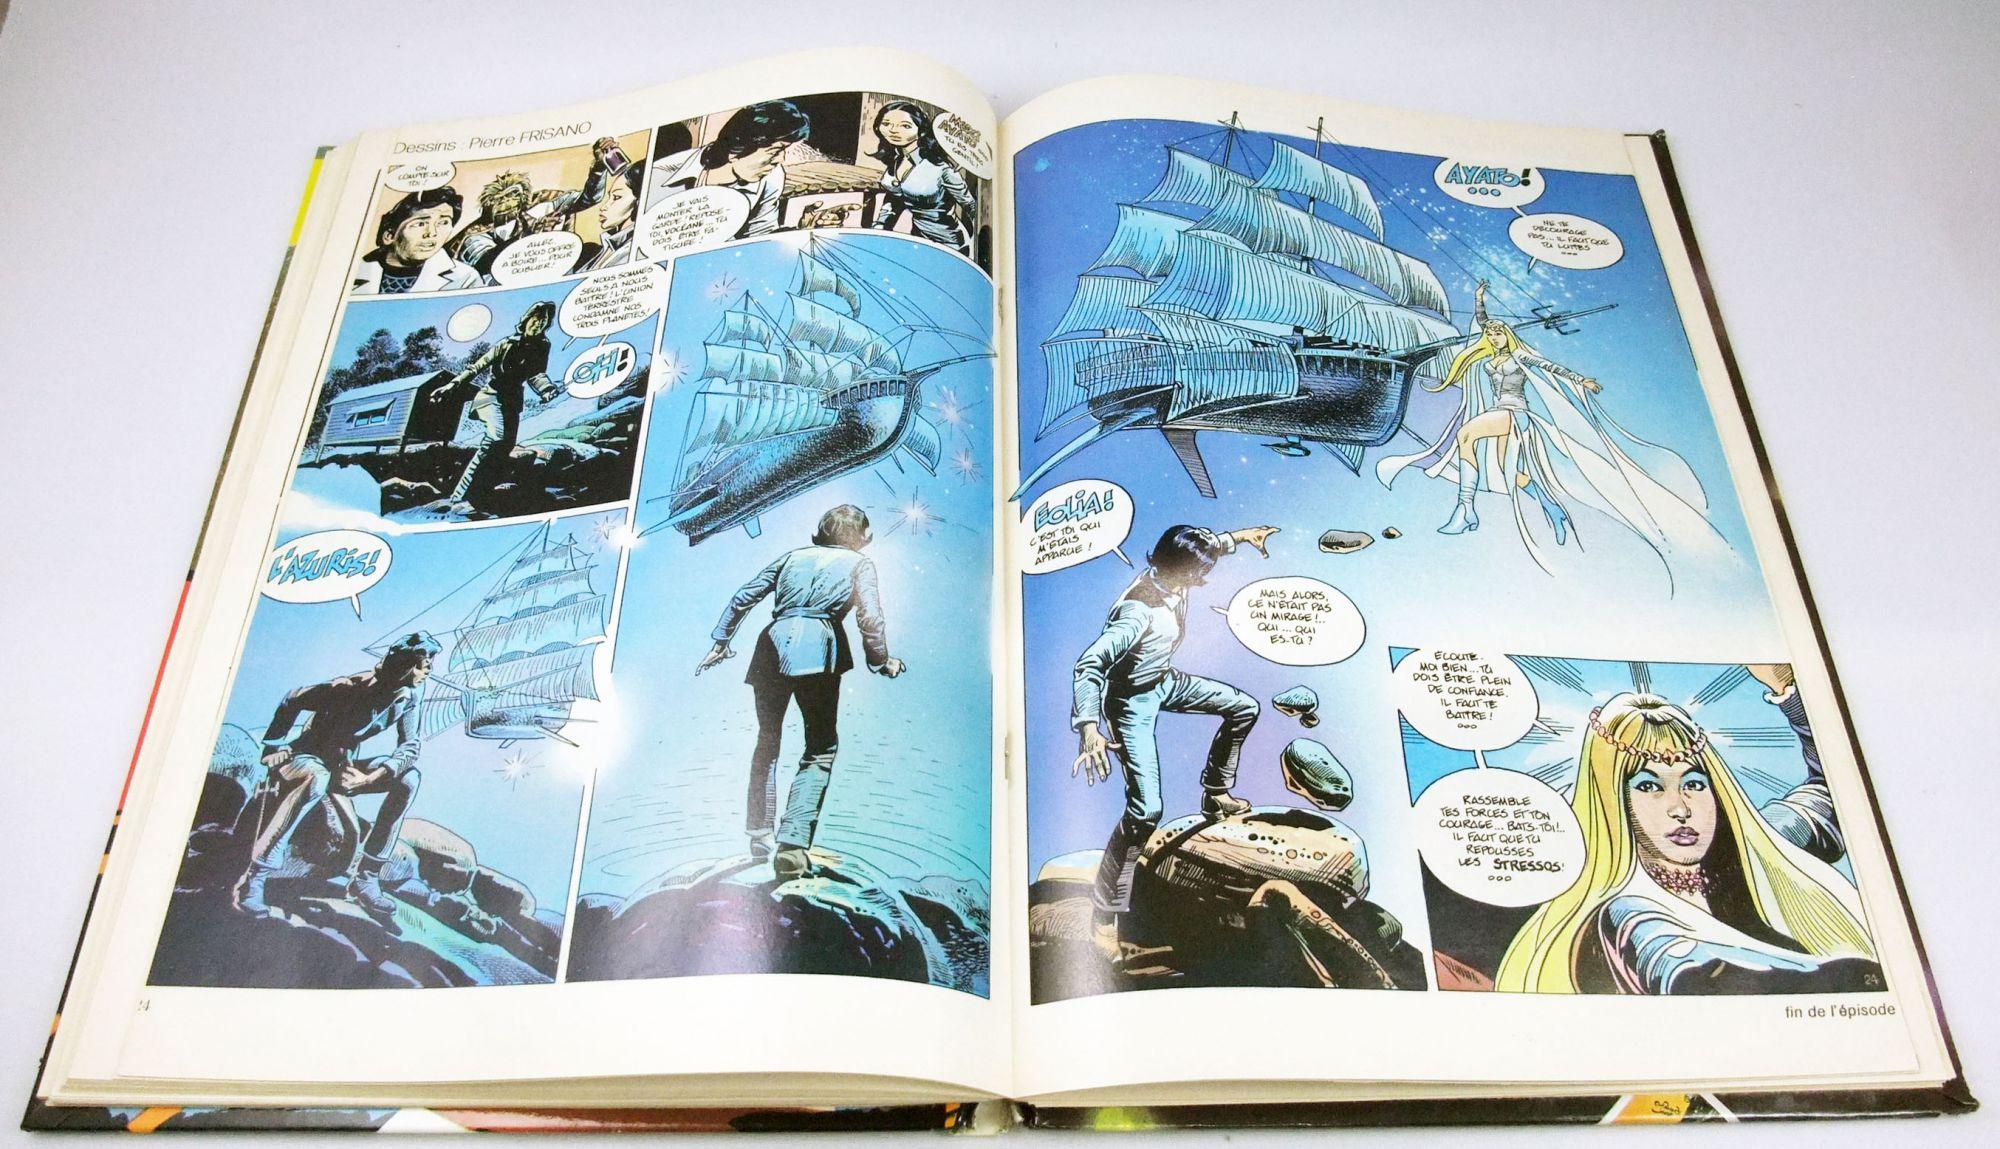 Le Journal de Captain Fulgur (Albator, San Ku Kai) - Recueil n°1 - Editions Dargaud